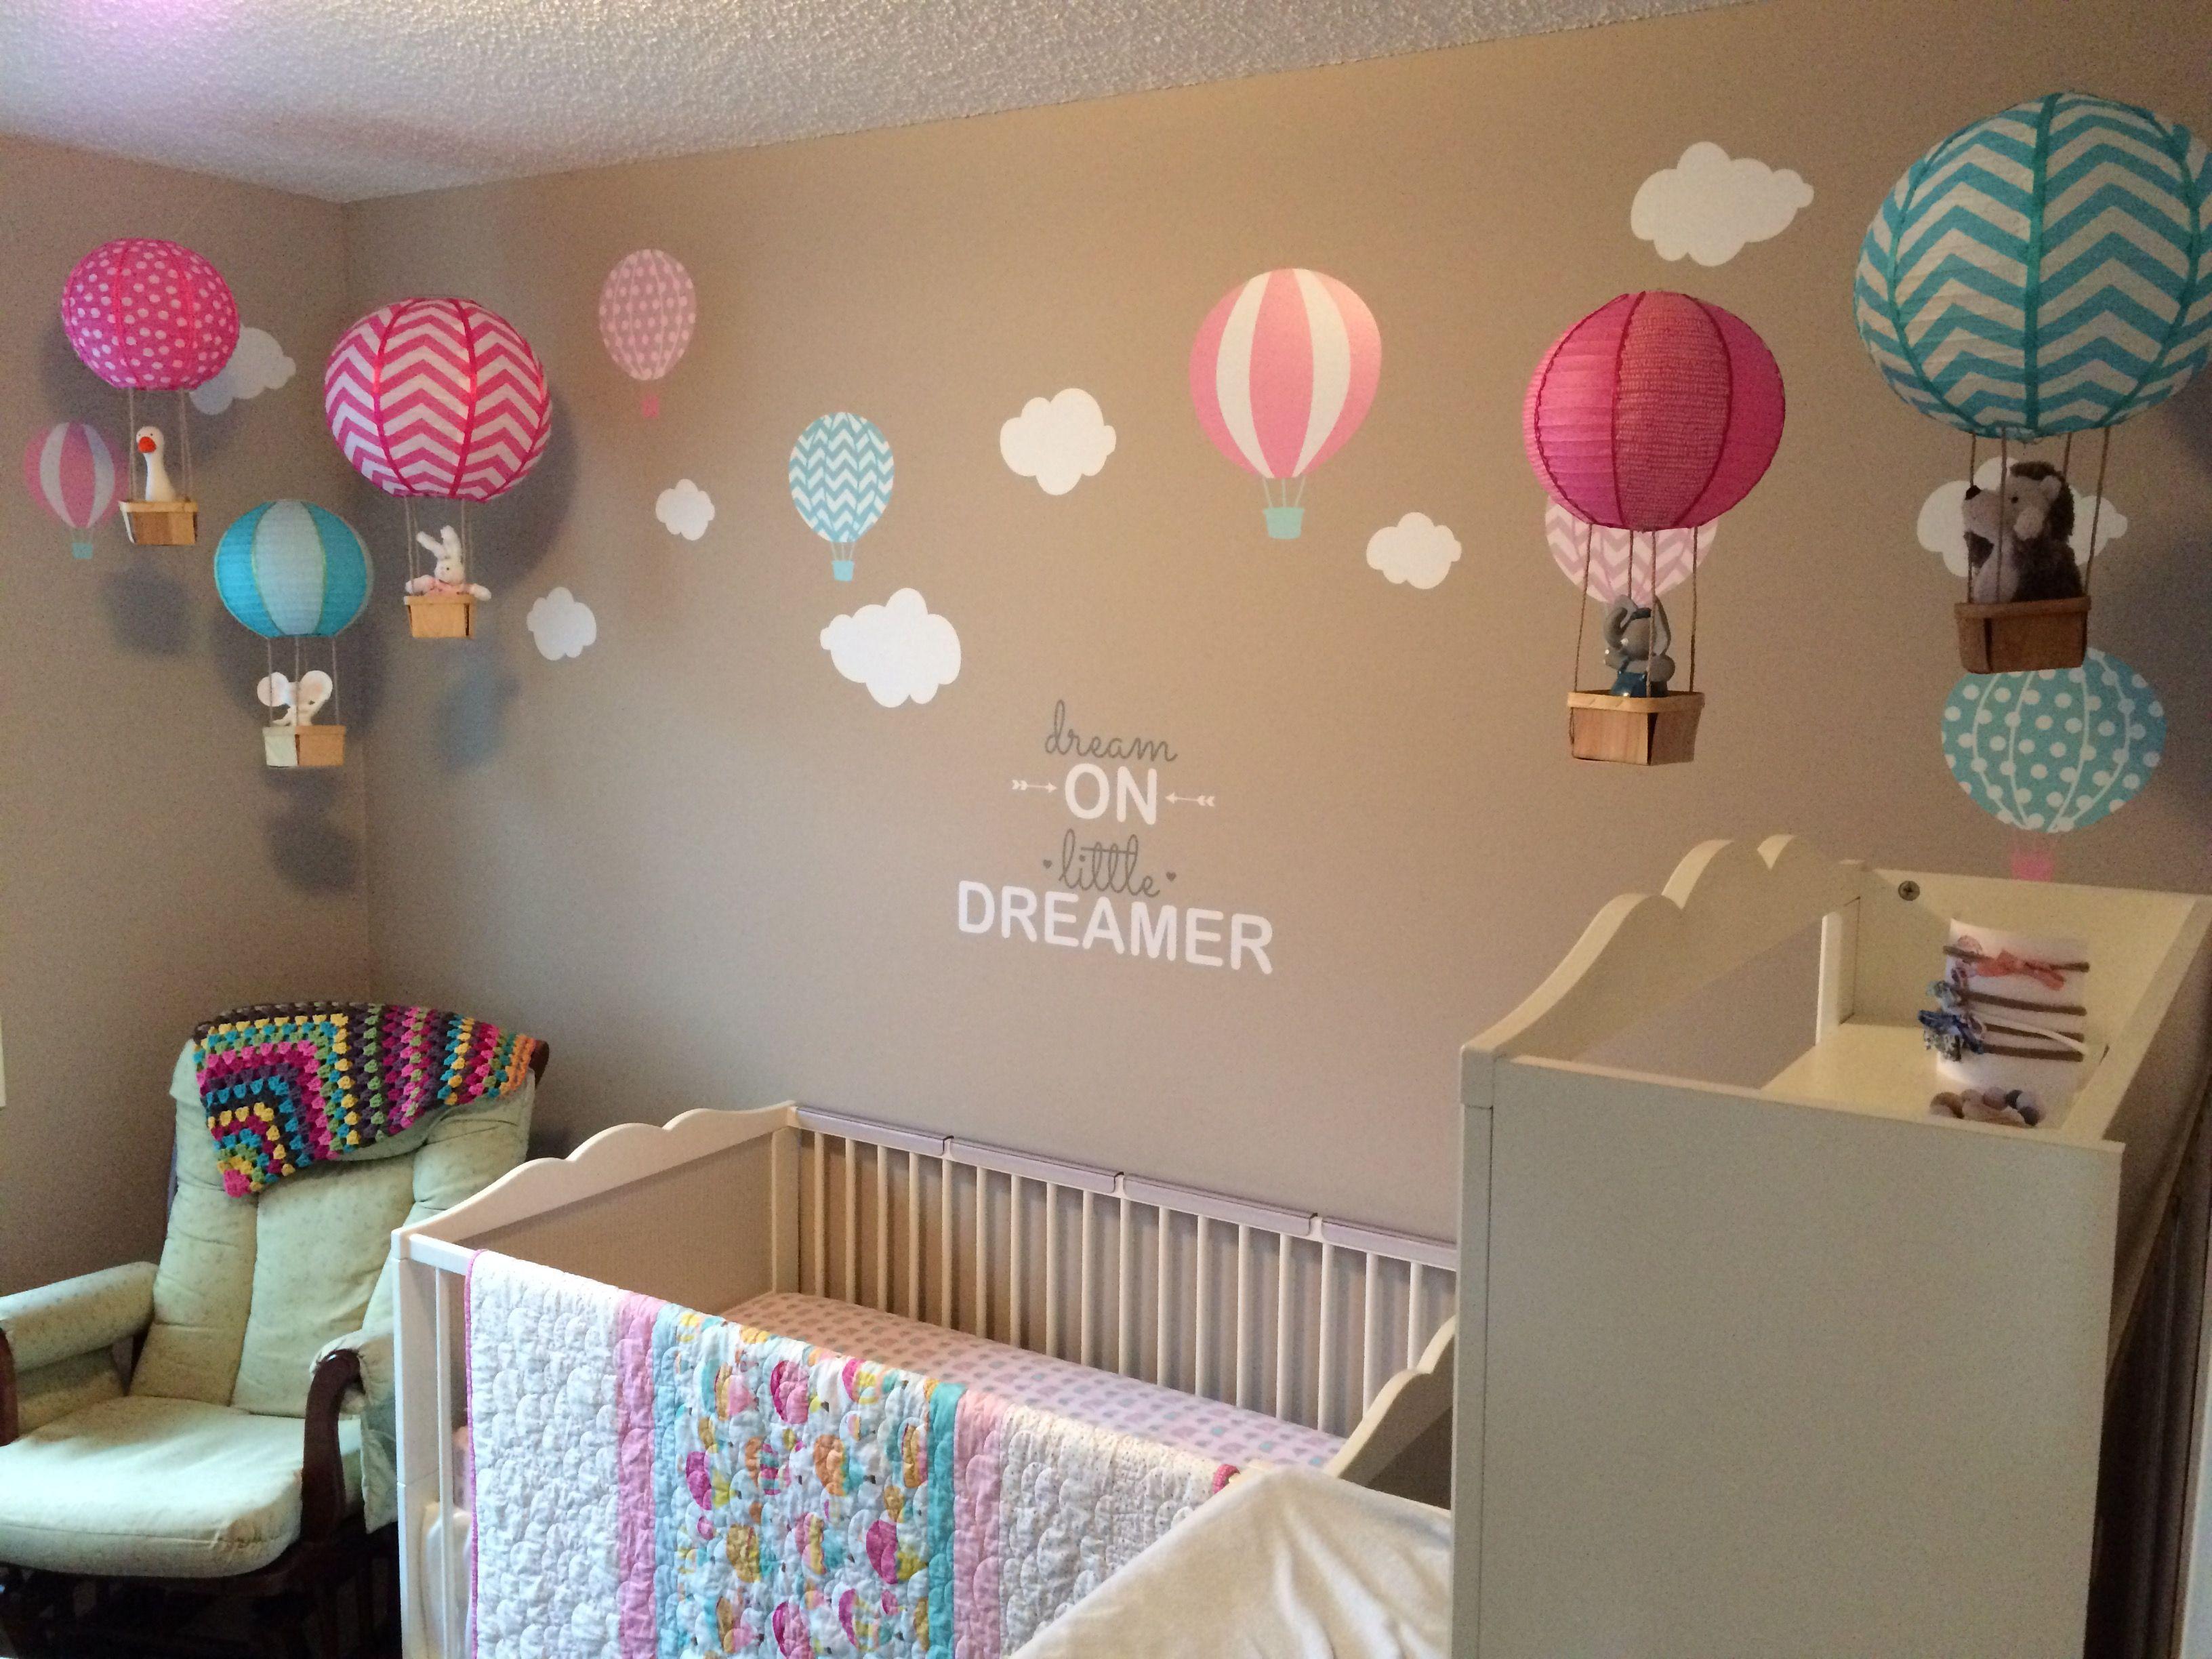 Homemade hot air balloons Hot air balloon nursery decor